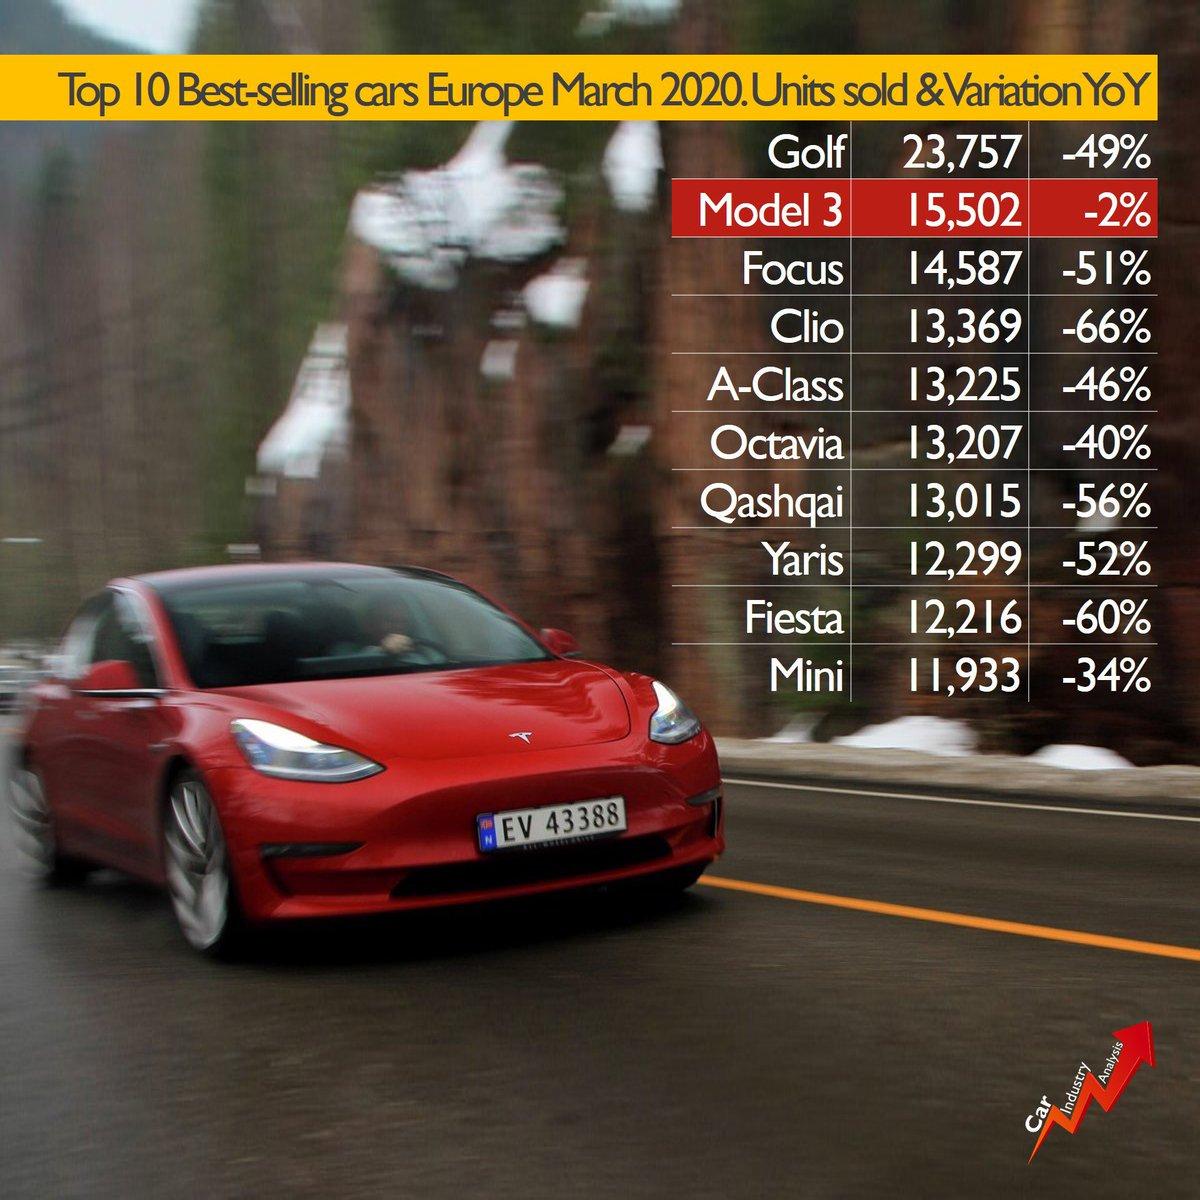 [Statistiques] Les chiffres européens  - Page 3 EWyY69UX0AEk6VL?format=jpg